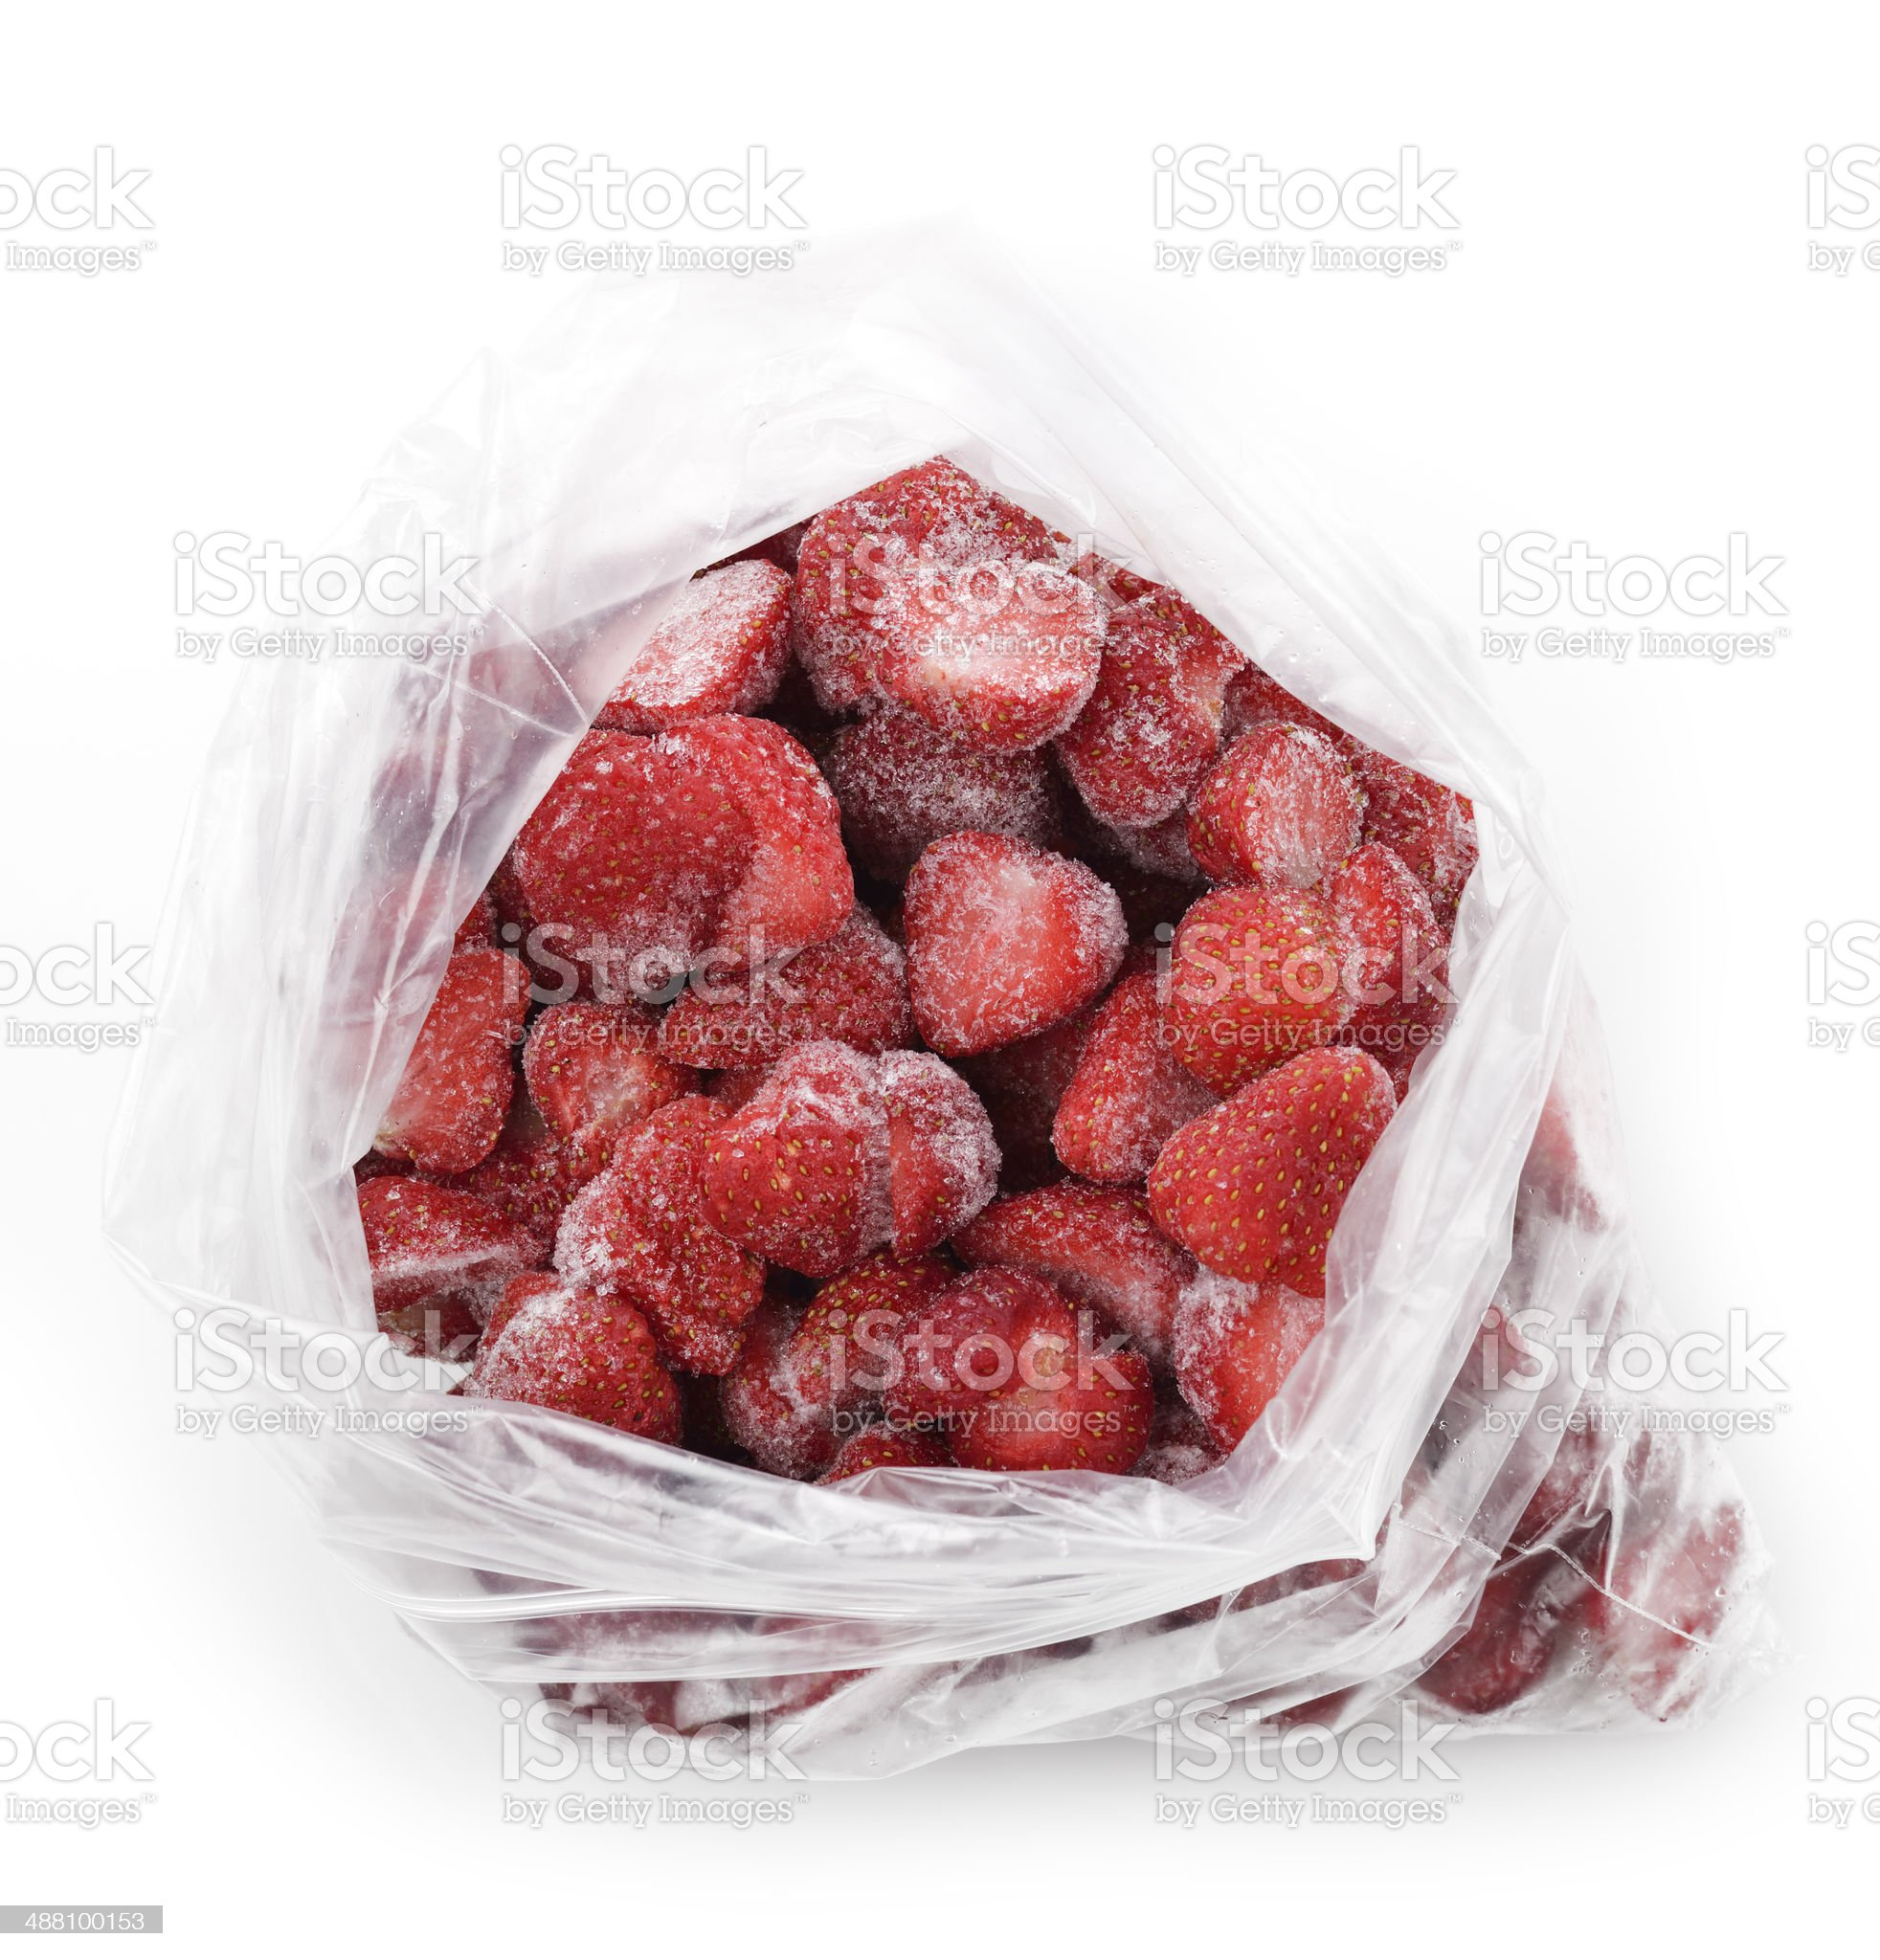 Frozen Strawberries royalty-free stock photo